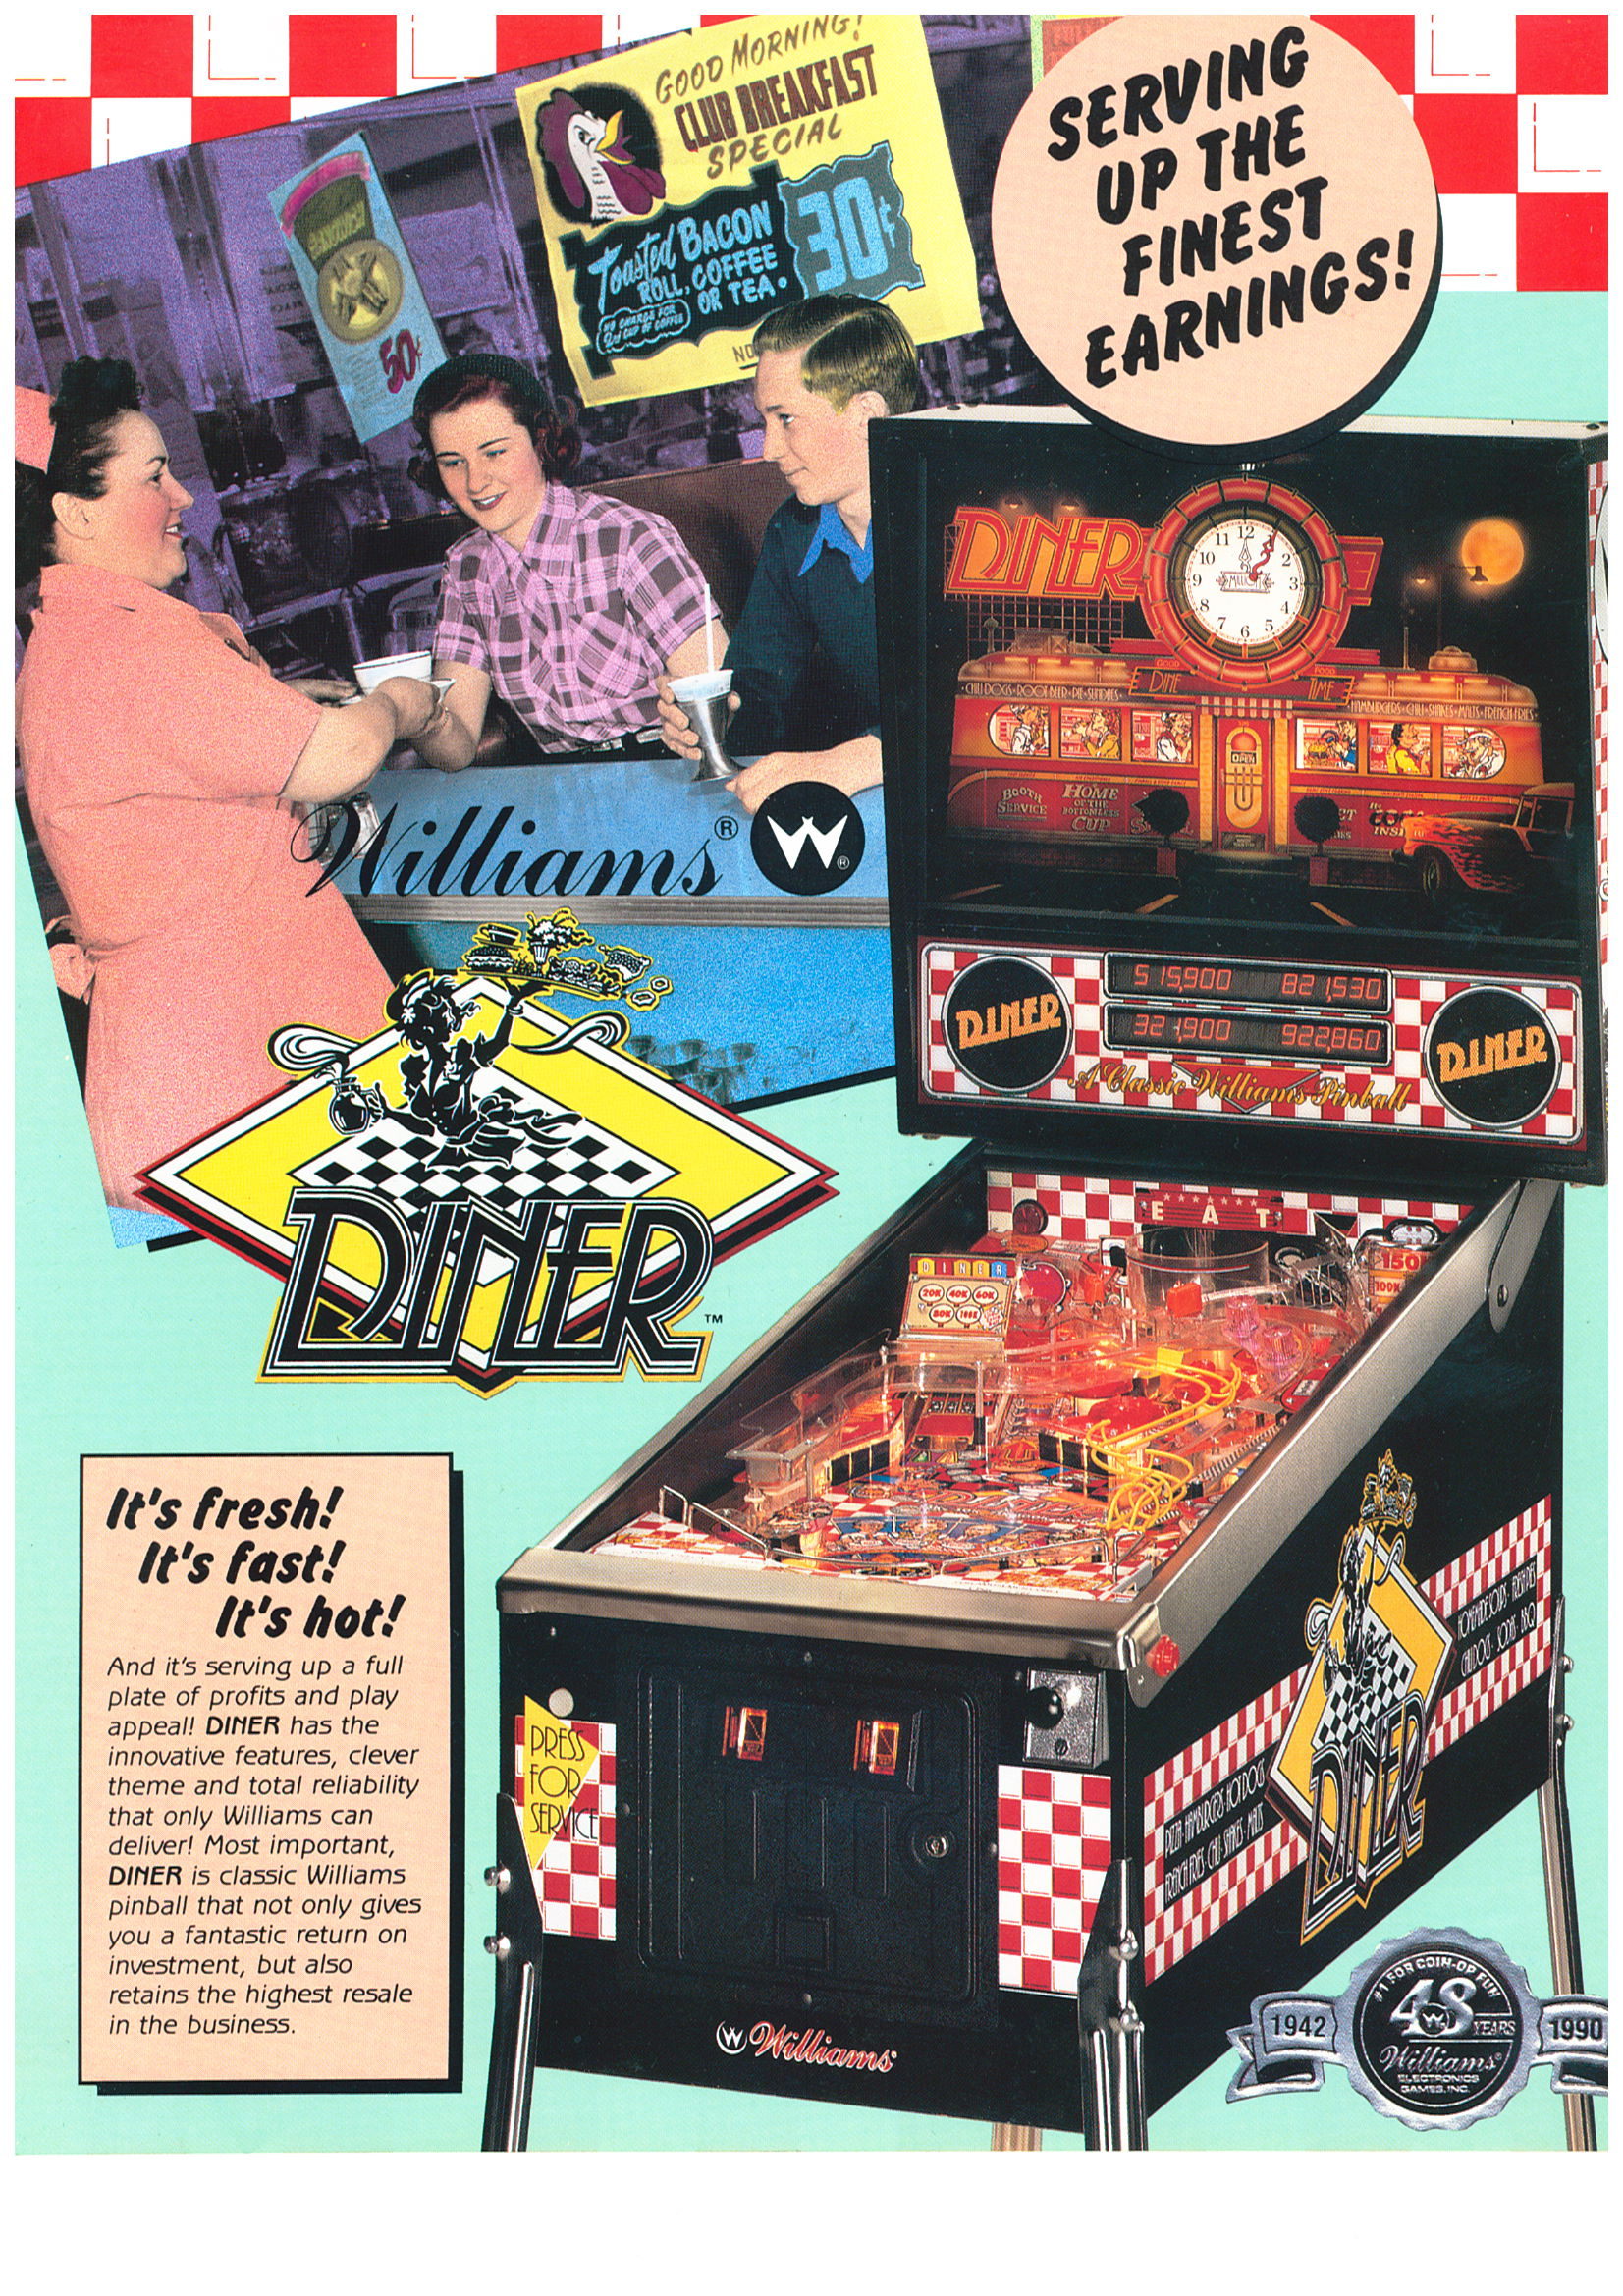 Kit caoutchoucs flipper  WILLIAMS WHIRLWIND  1990 blanc elastique pinball